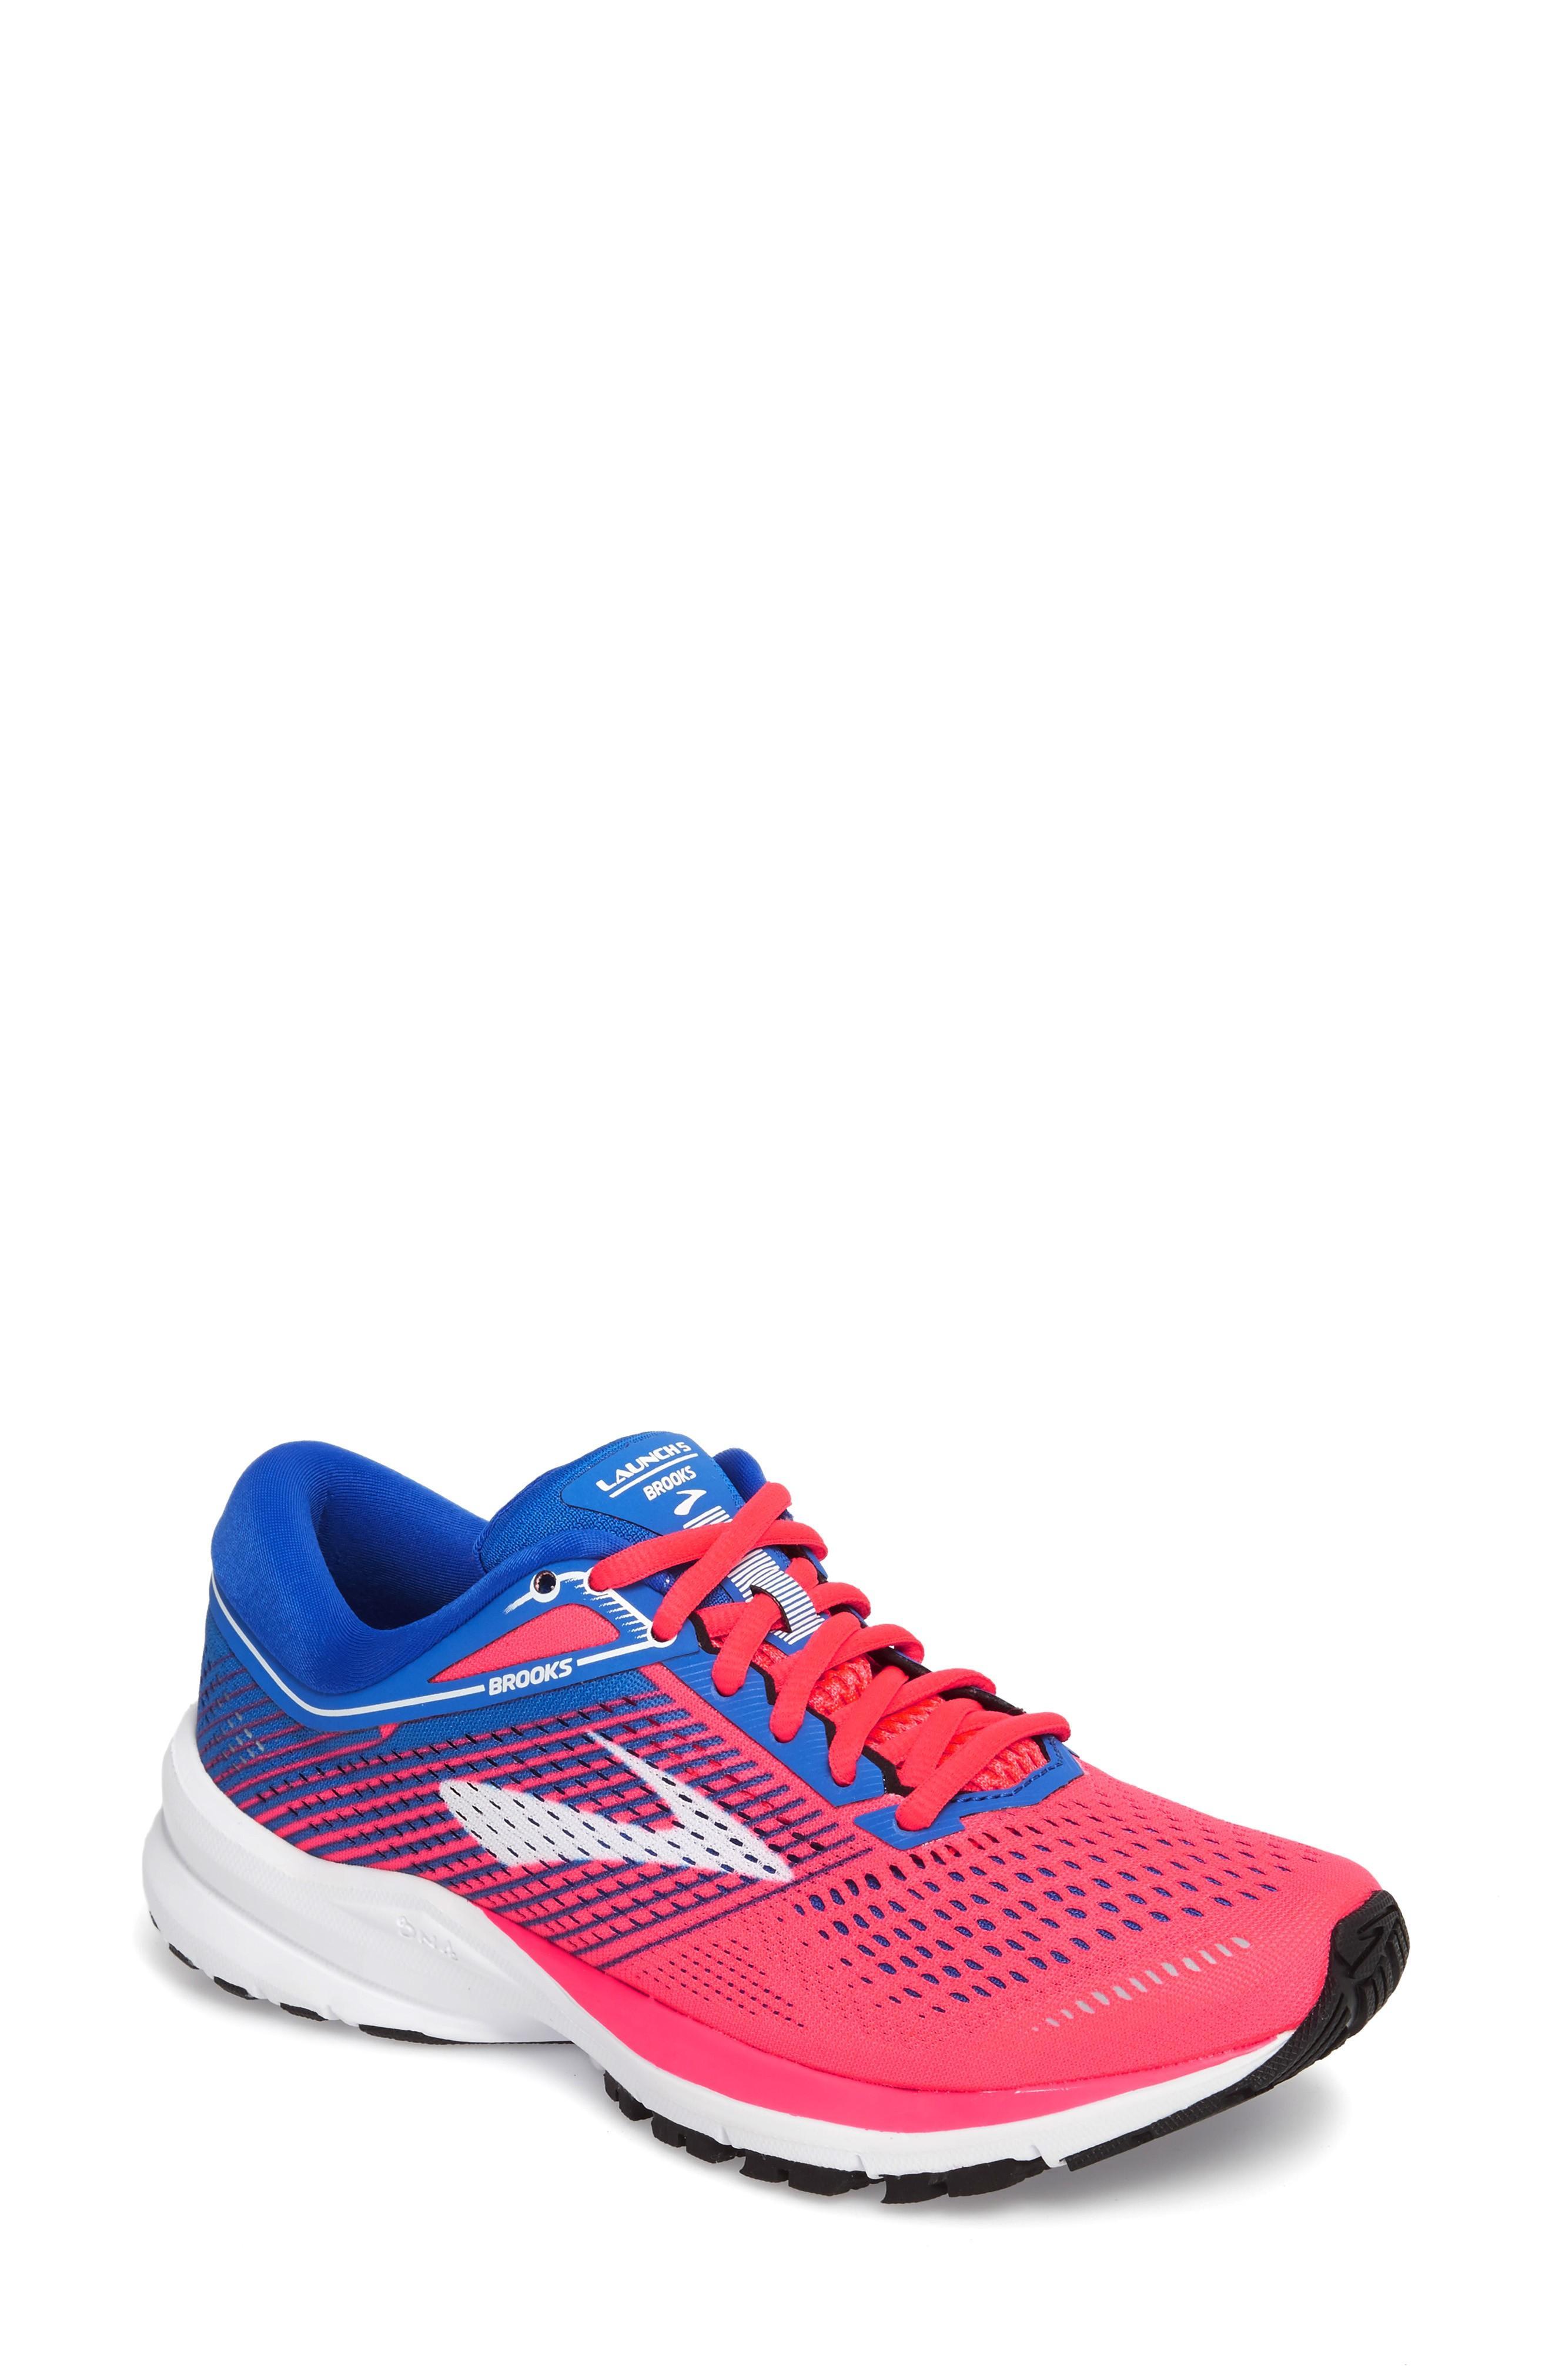 e1885412b56 Brooks Launch 5 Running Shoe In Pink  Blue  White